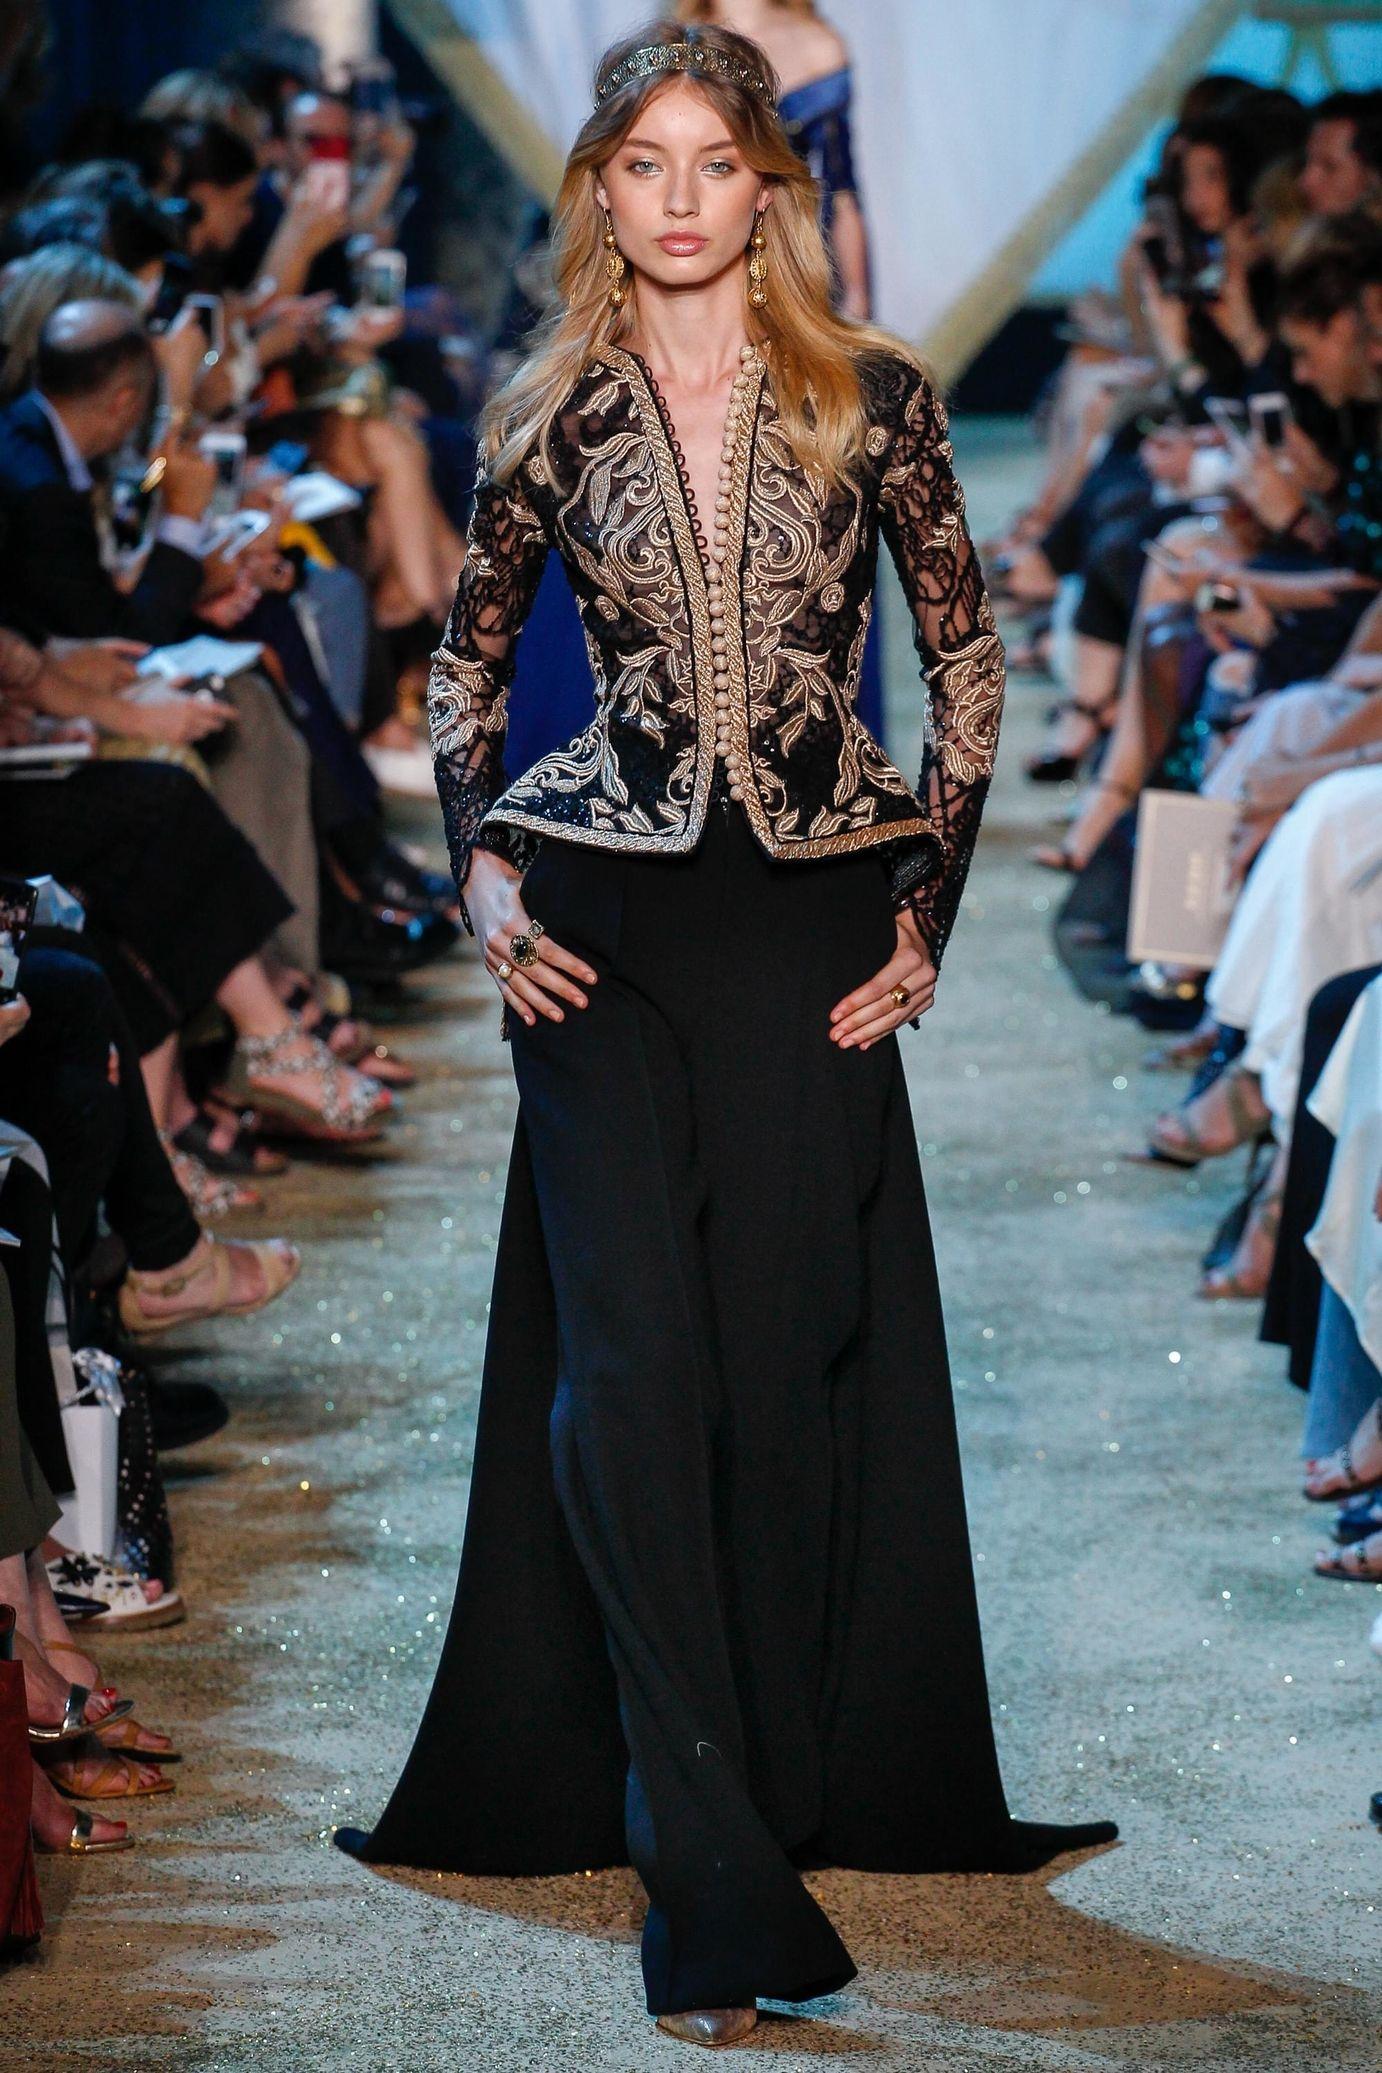 Model de veste femme 2018